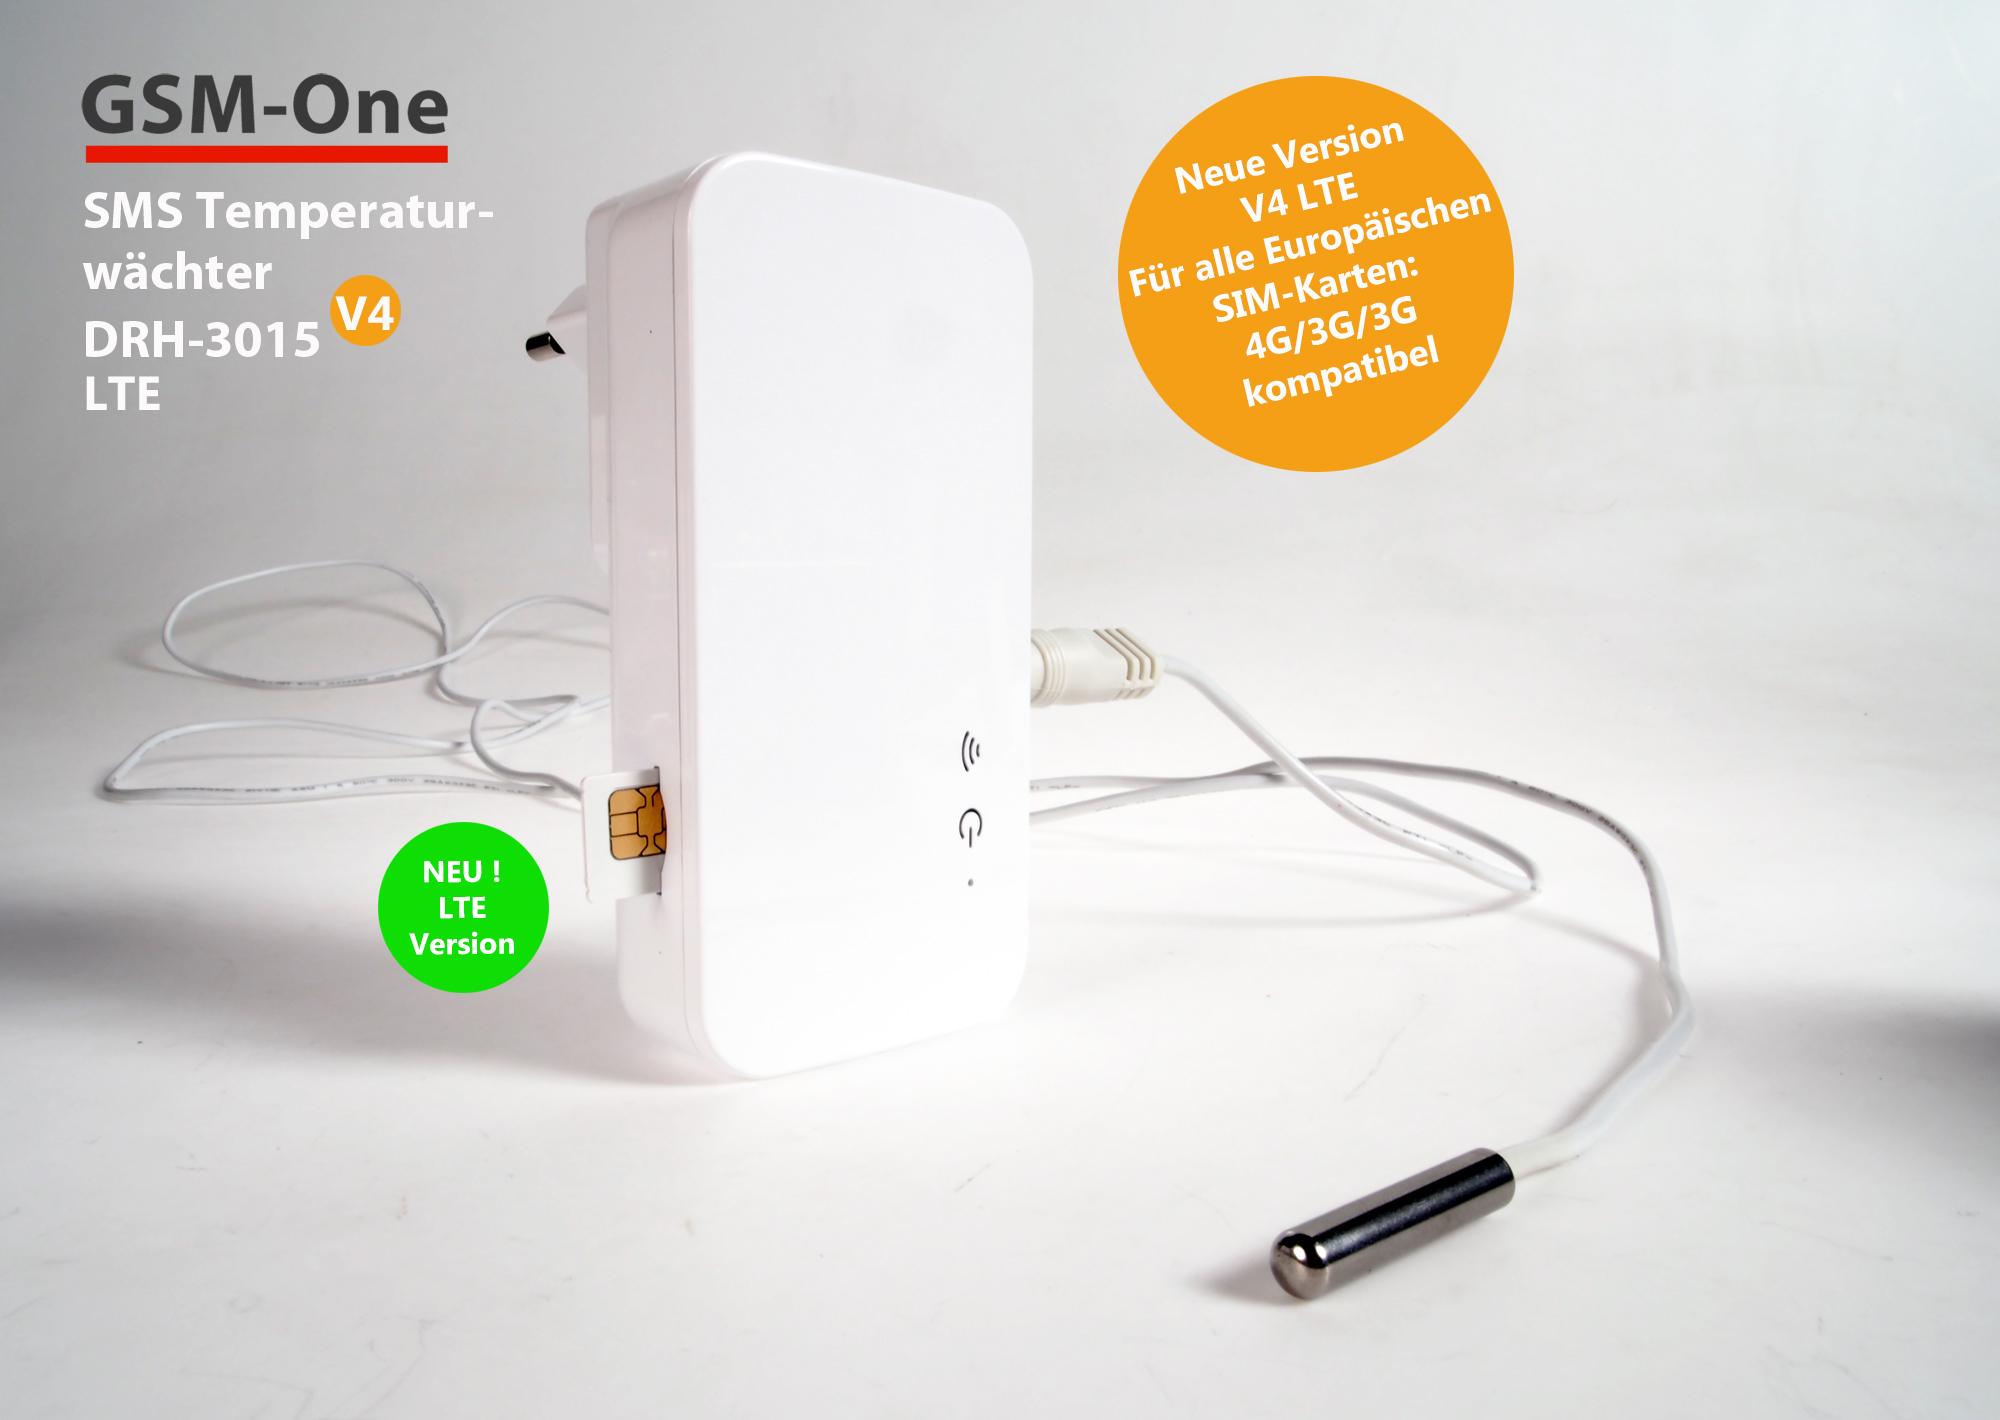 GSM-Temperaturwächter DRH-3015-V4 , 4G/LTE VERSION